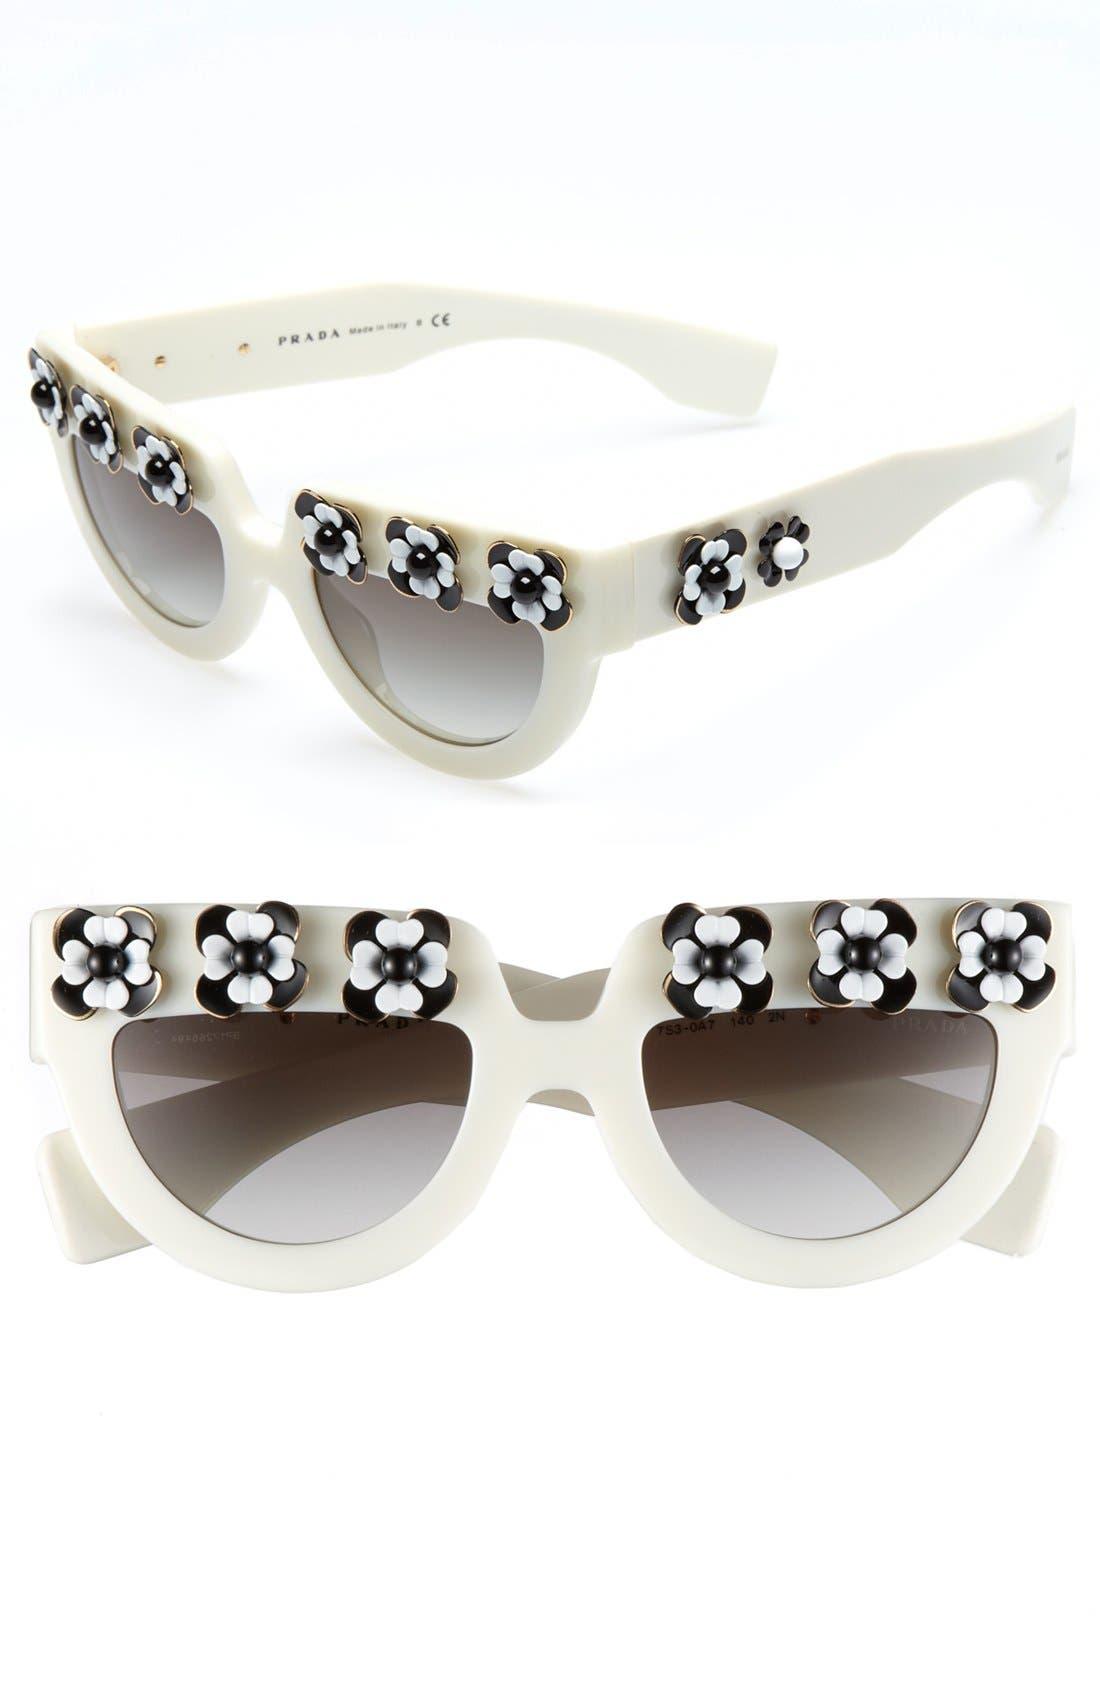 Alternate Image 1 Selected - Prada 'Irregular Flowers' 50mm Sunglasses